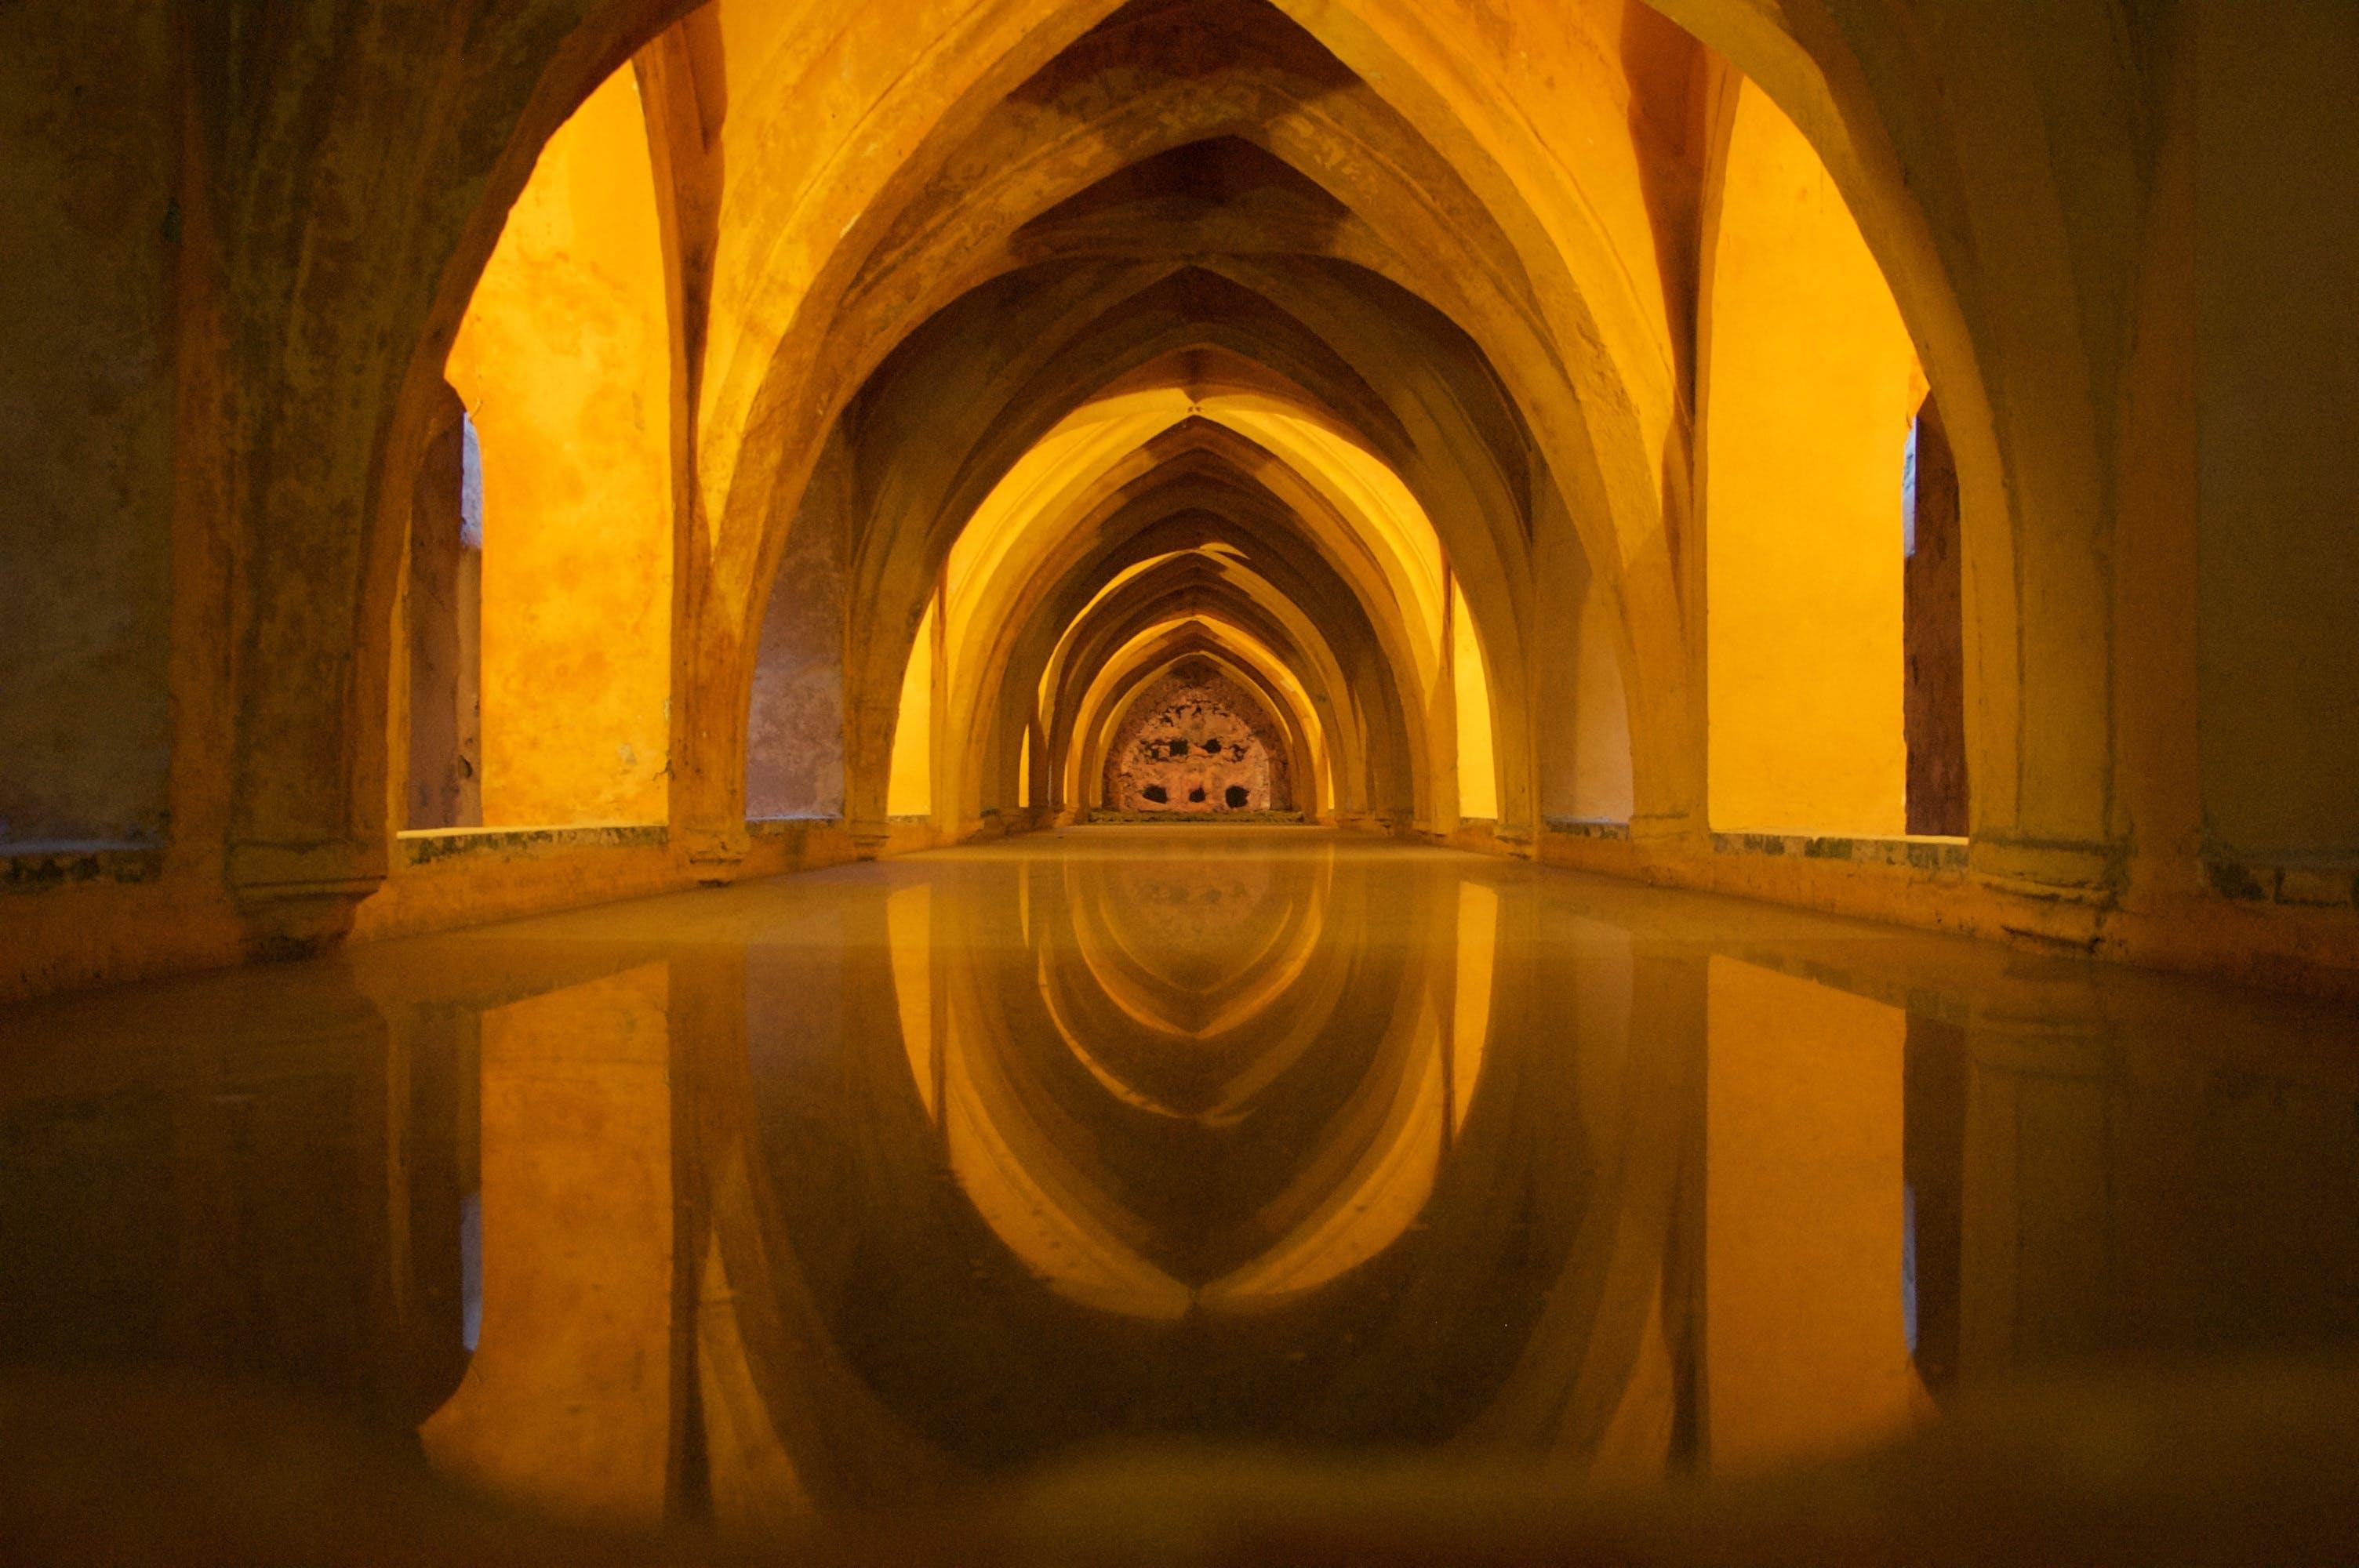 Gratis lagerfoto af andalusien, arkitektur, bue, buer